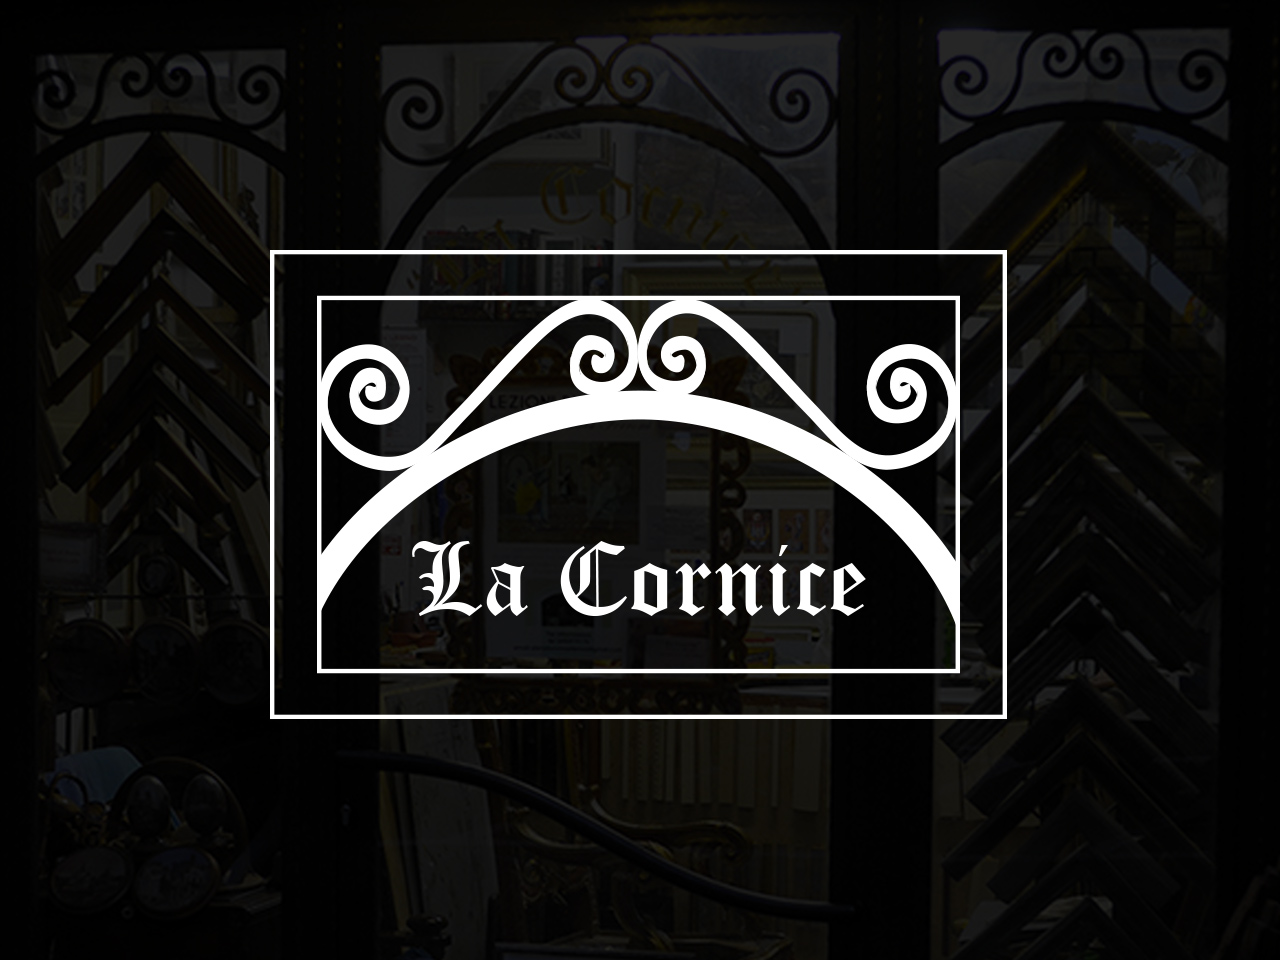 La Cornice